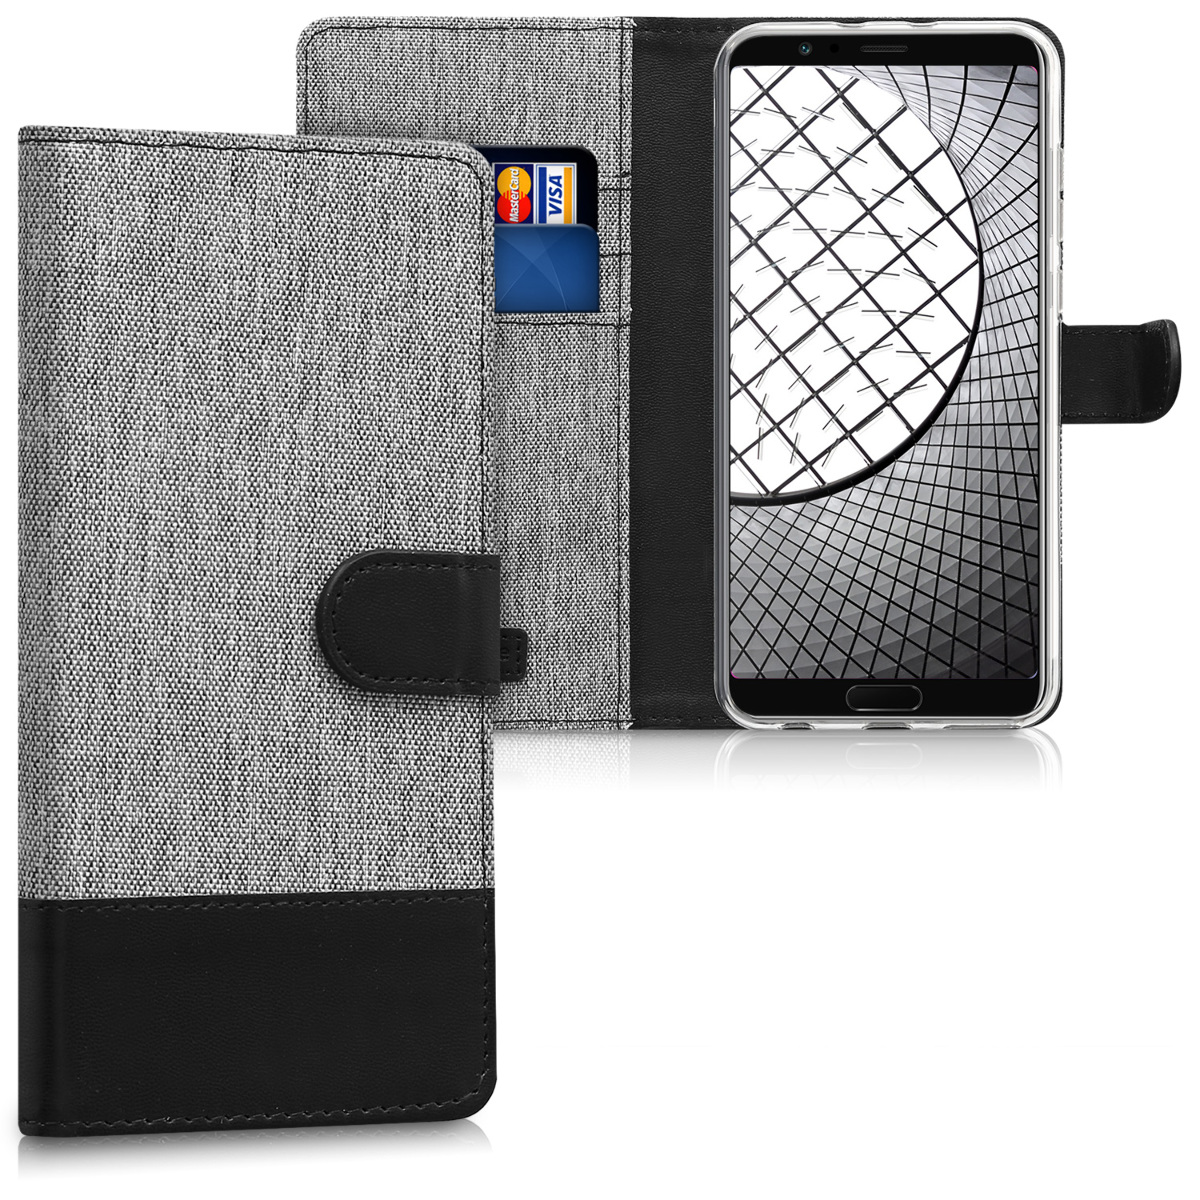 KW Θήκη Πορτοφόλι Huawei Honor View 10 / Honor V10 - Συνθετικό δέρμα - Grey / Black (43870.01)